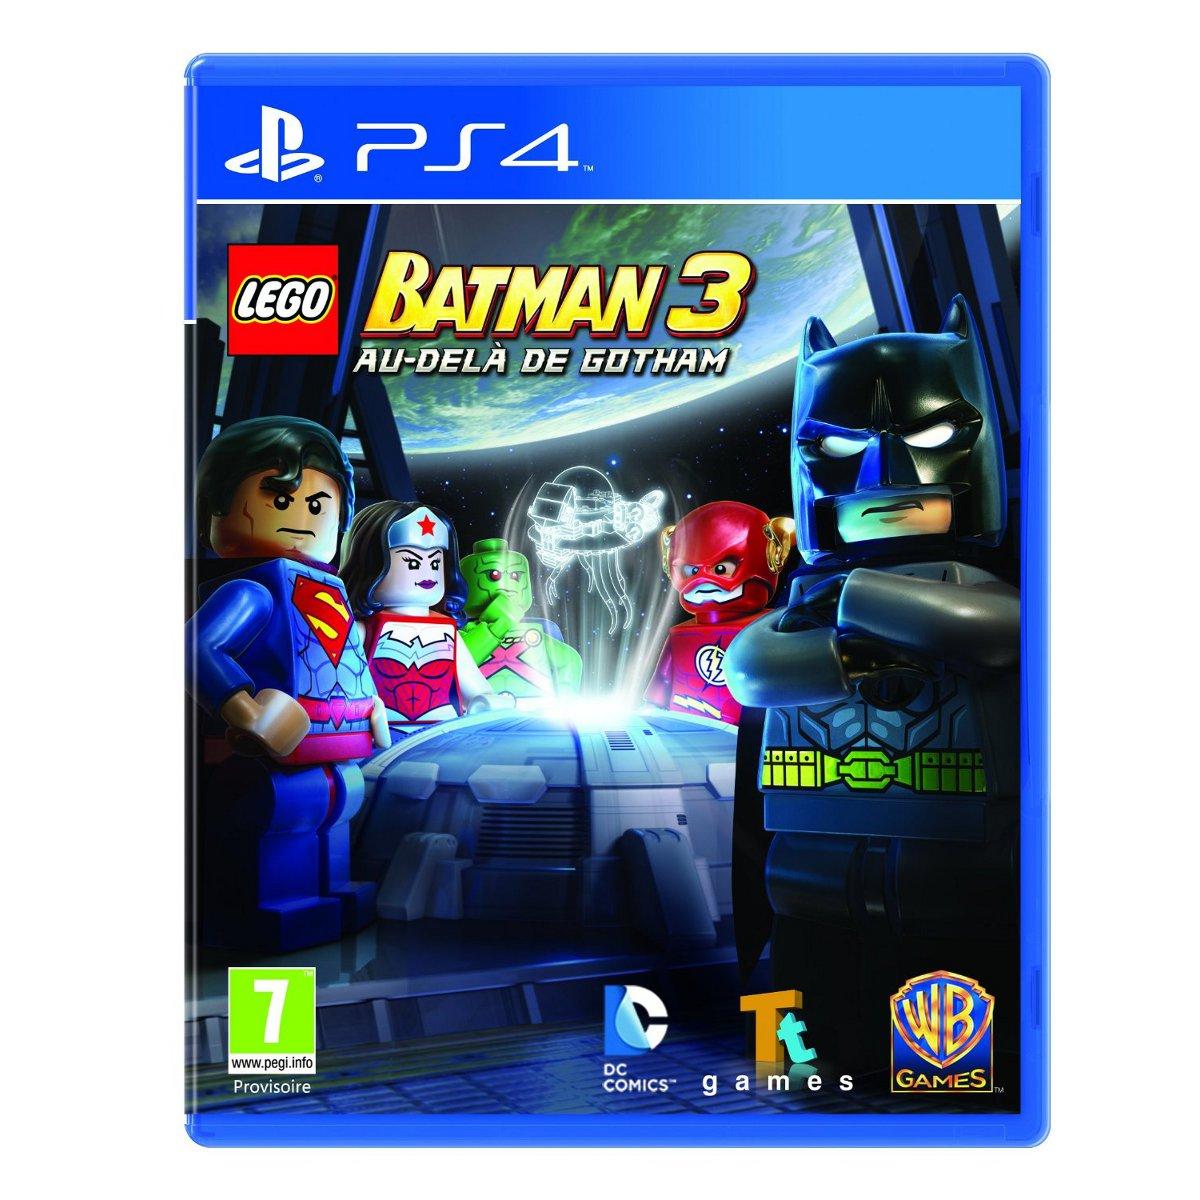 lego batman 3 au d l de gotham ps4 jeux ps4 warner bros games sur. Black Bedroom Furniture Sets. Home Design Ideas